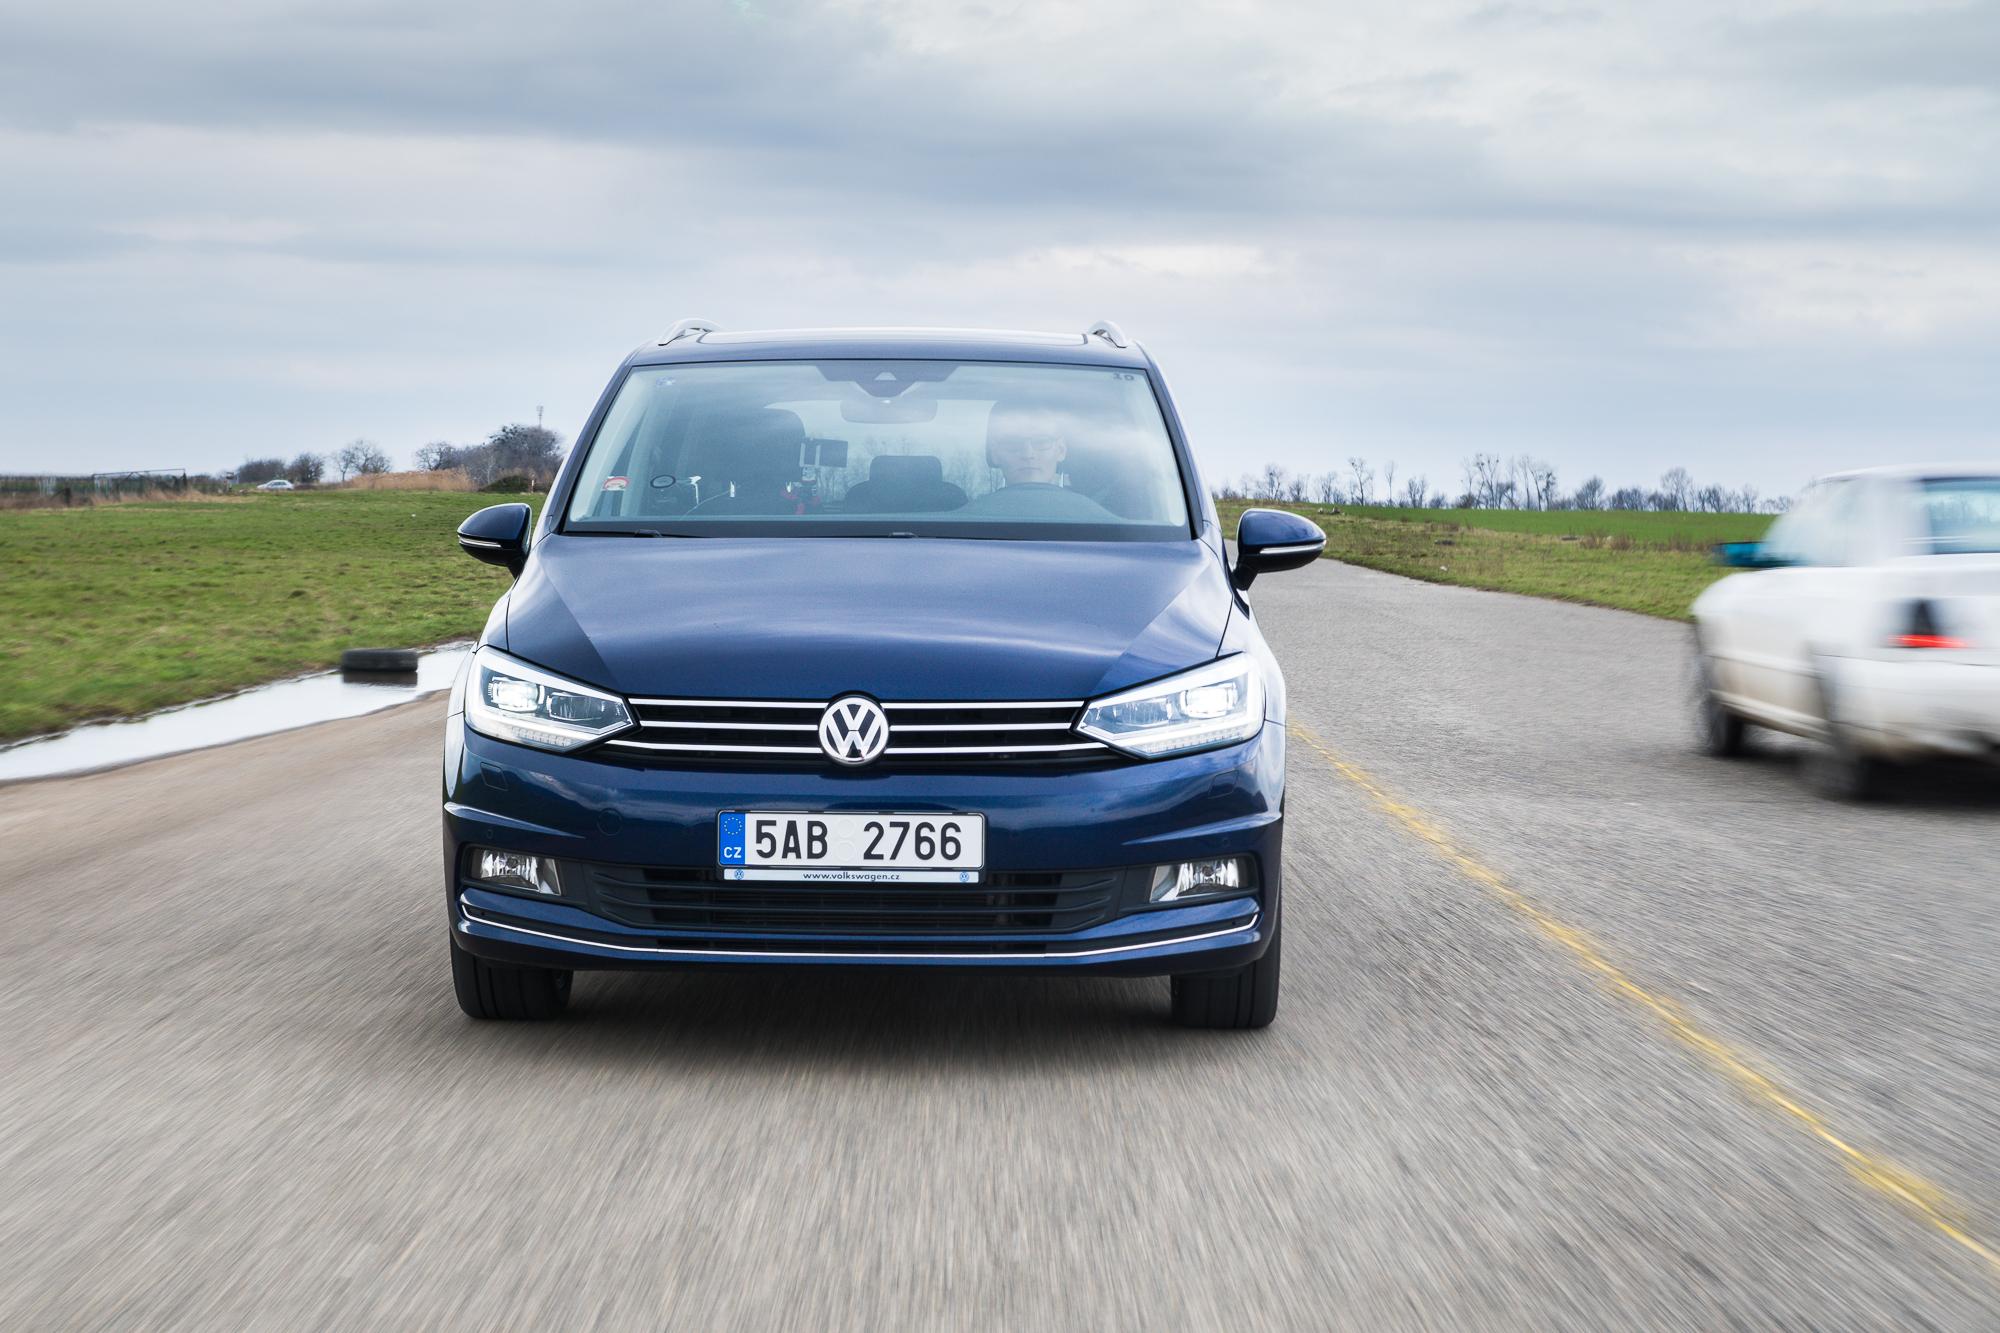 VW Touran s infotainmentem Discover Pro a Car-netem | AUTODAYS